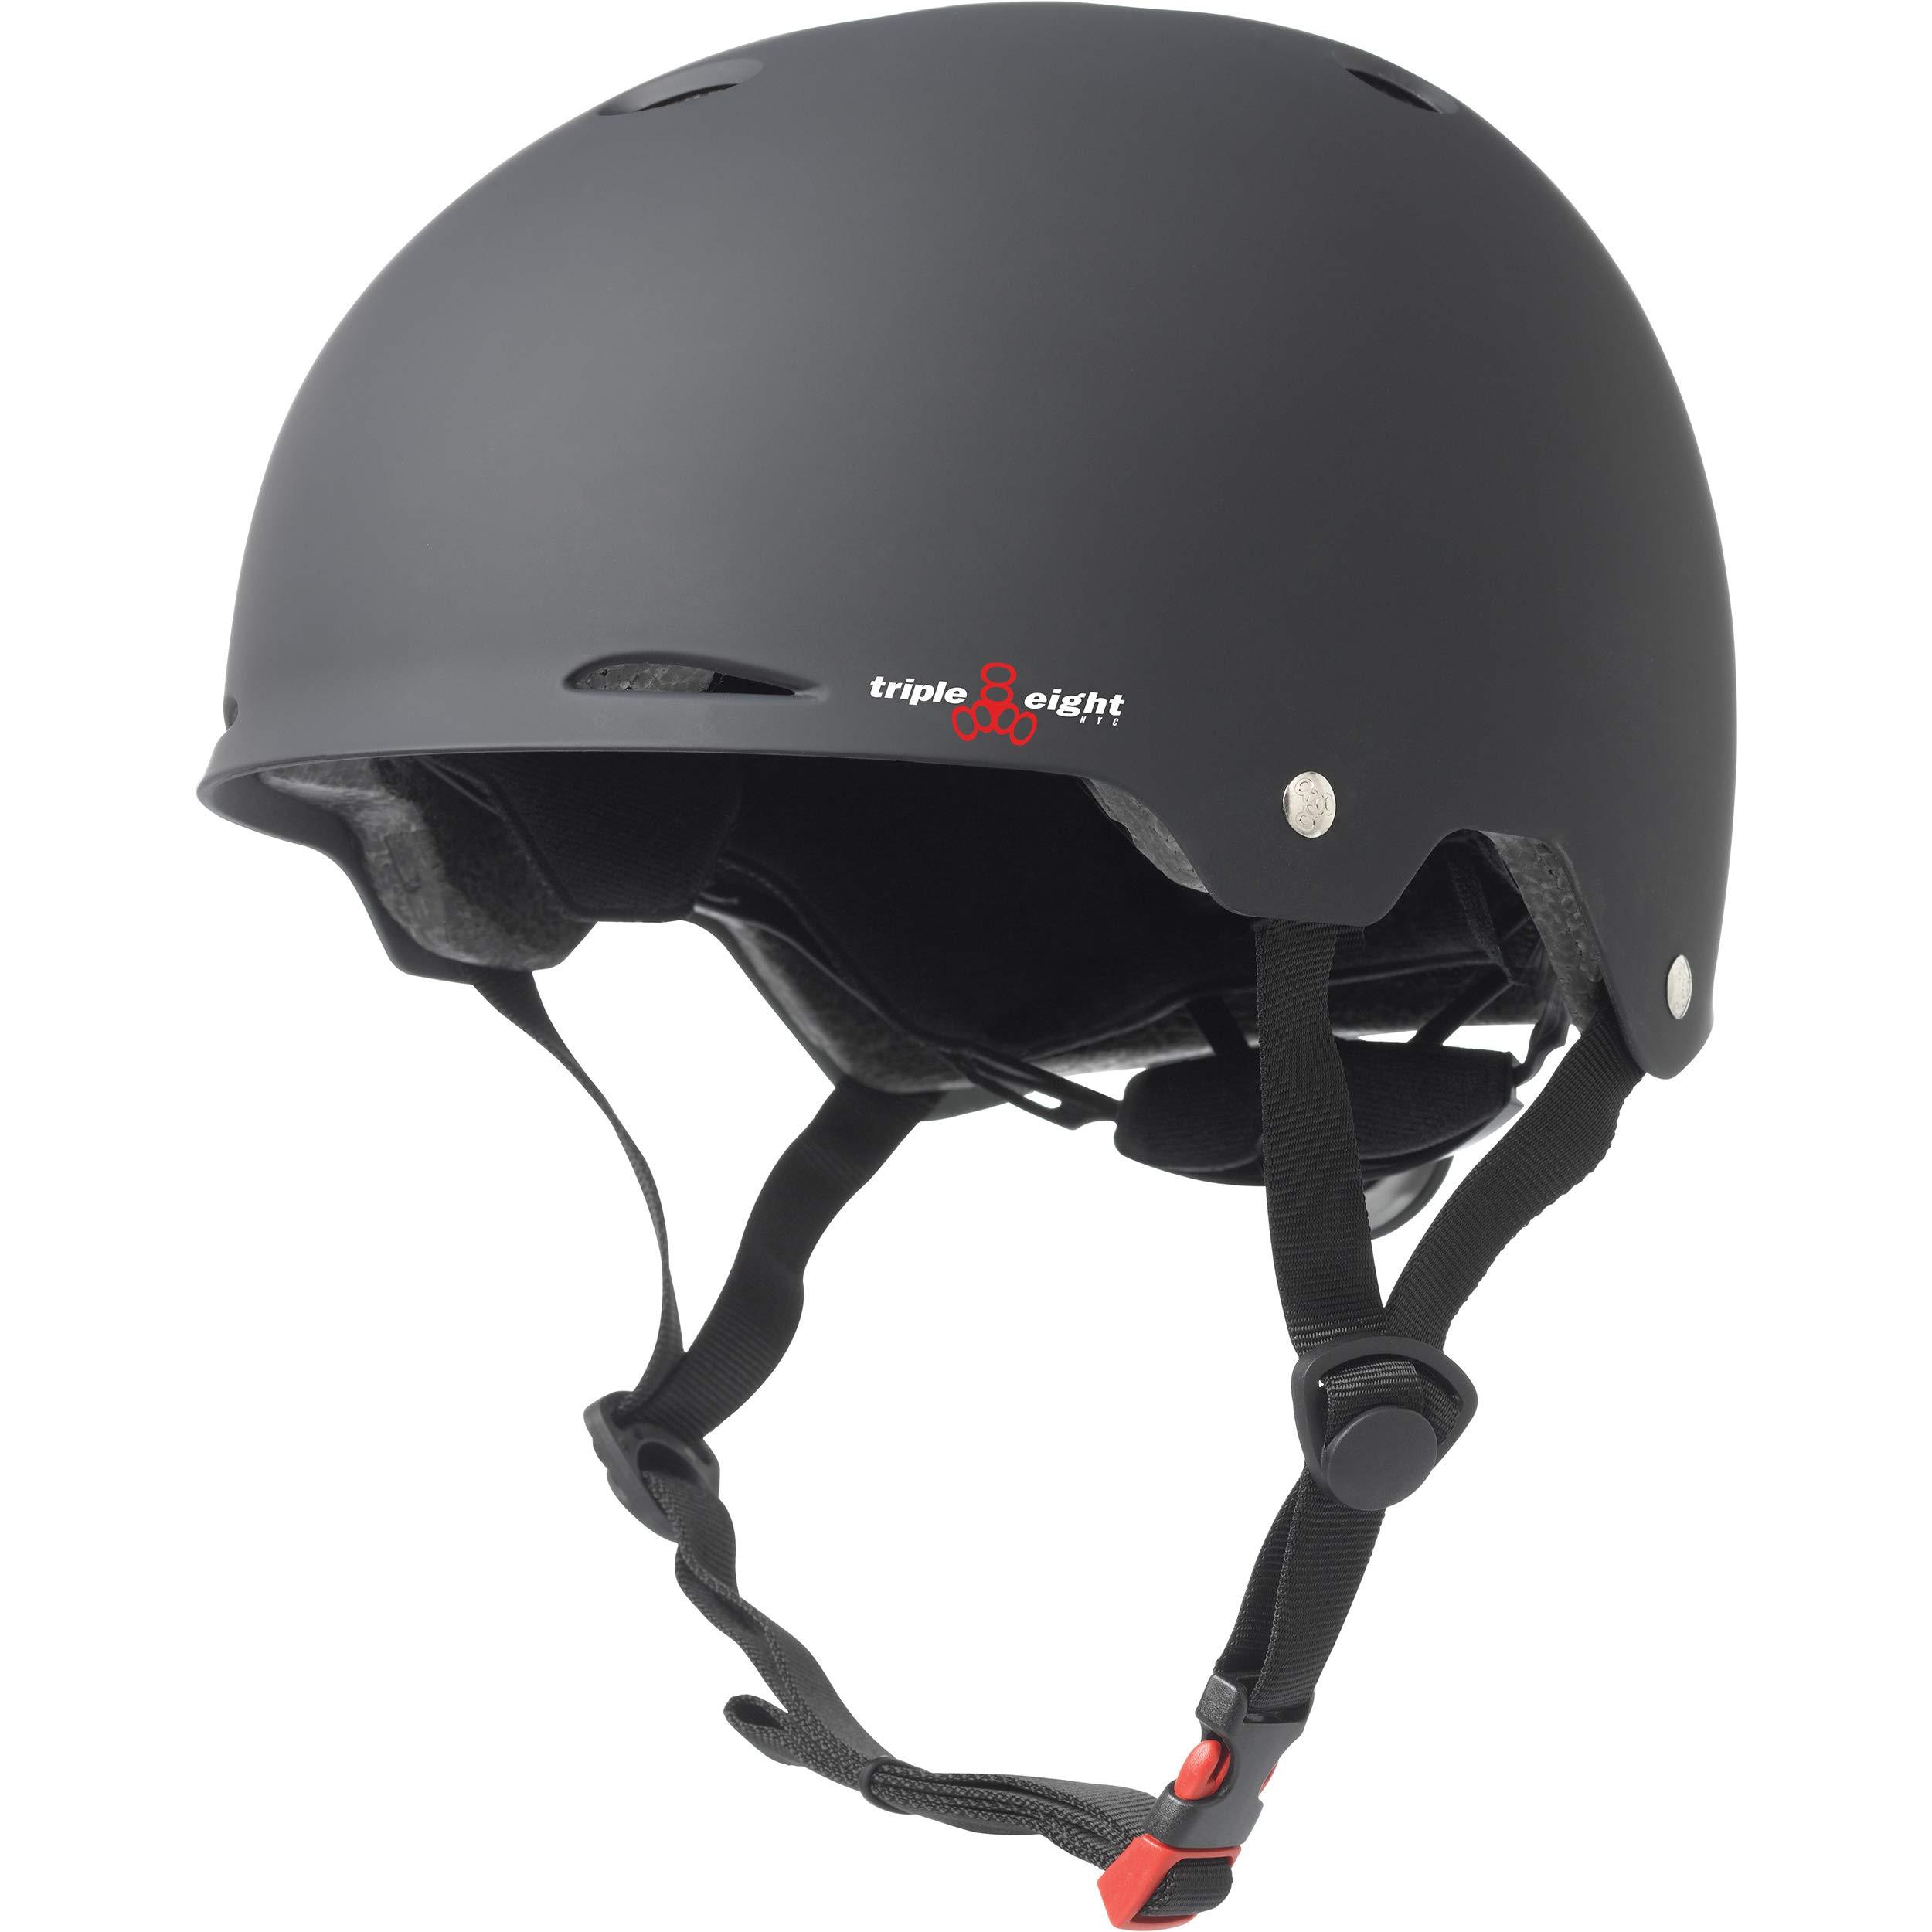 Triple Eight Gotham Dual Certified Skateboard and Bike Helmet, Black Matte, Large / X-Large